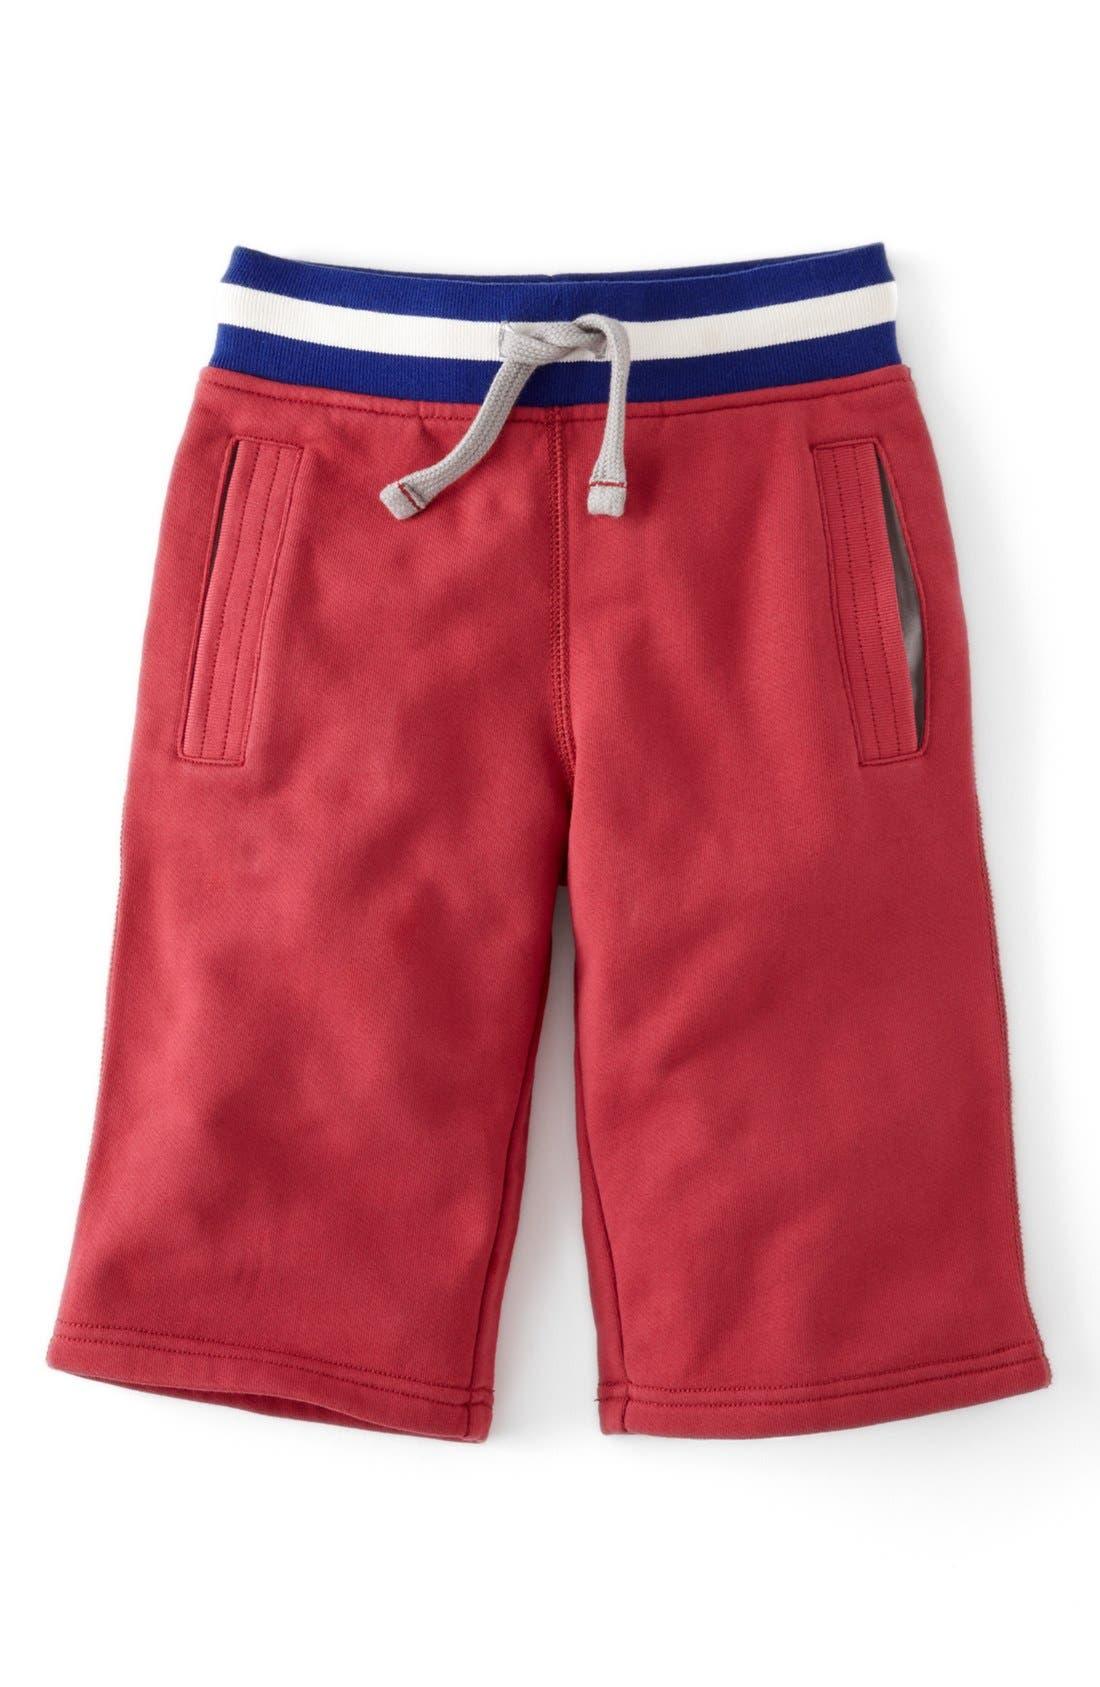 Main Image - Mini Boden Knit Shorts (Toddler Boys, Little Boys & Big Boys)